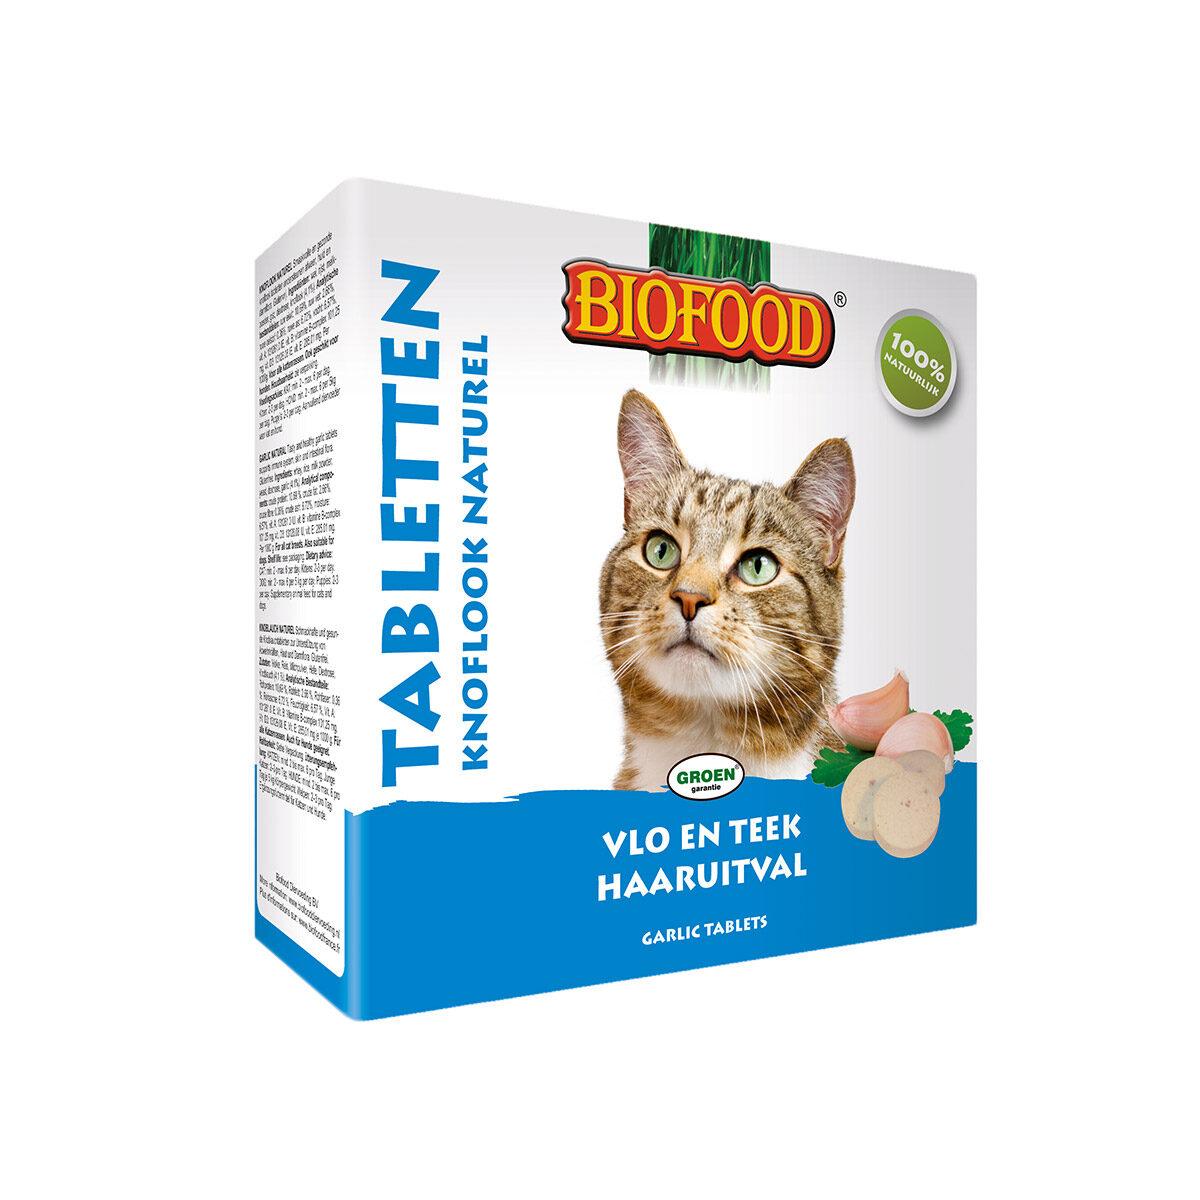 Biofood Kattensnoepjes Anti-Vlo Naturel 100stuks